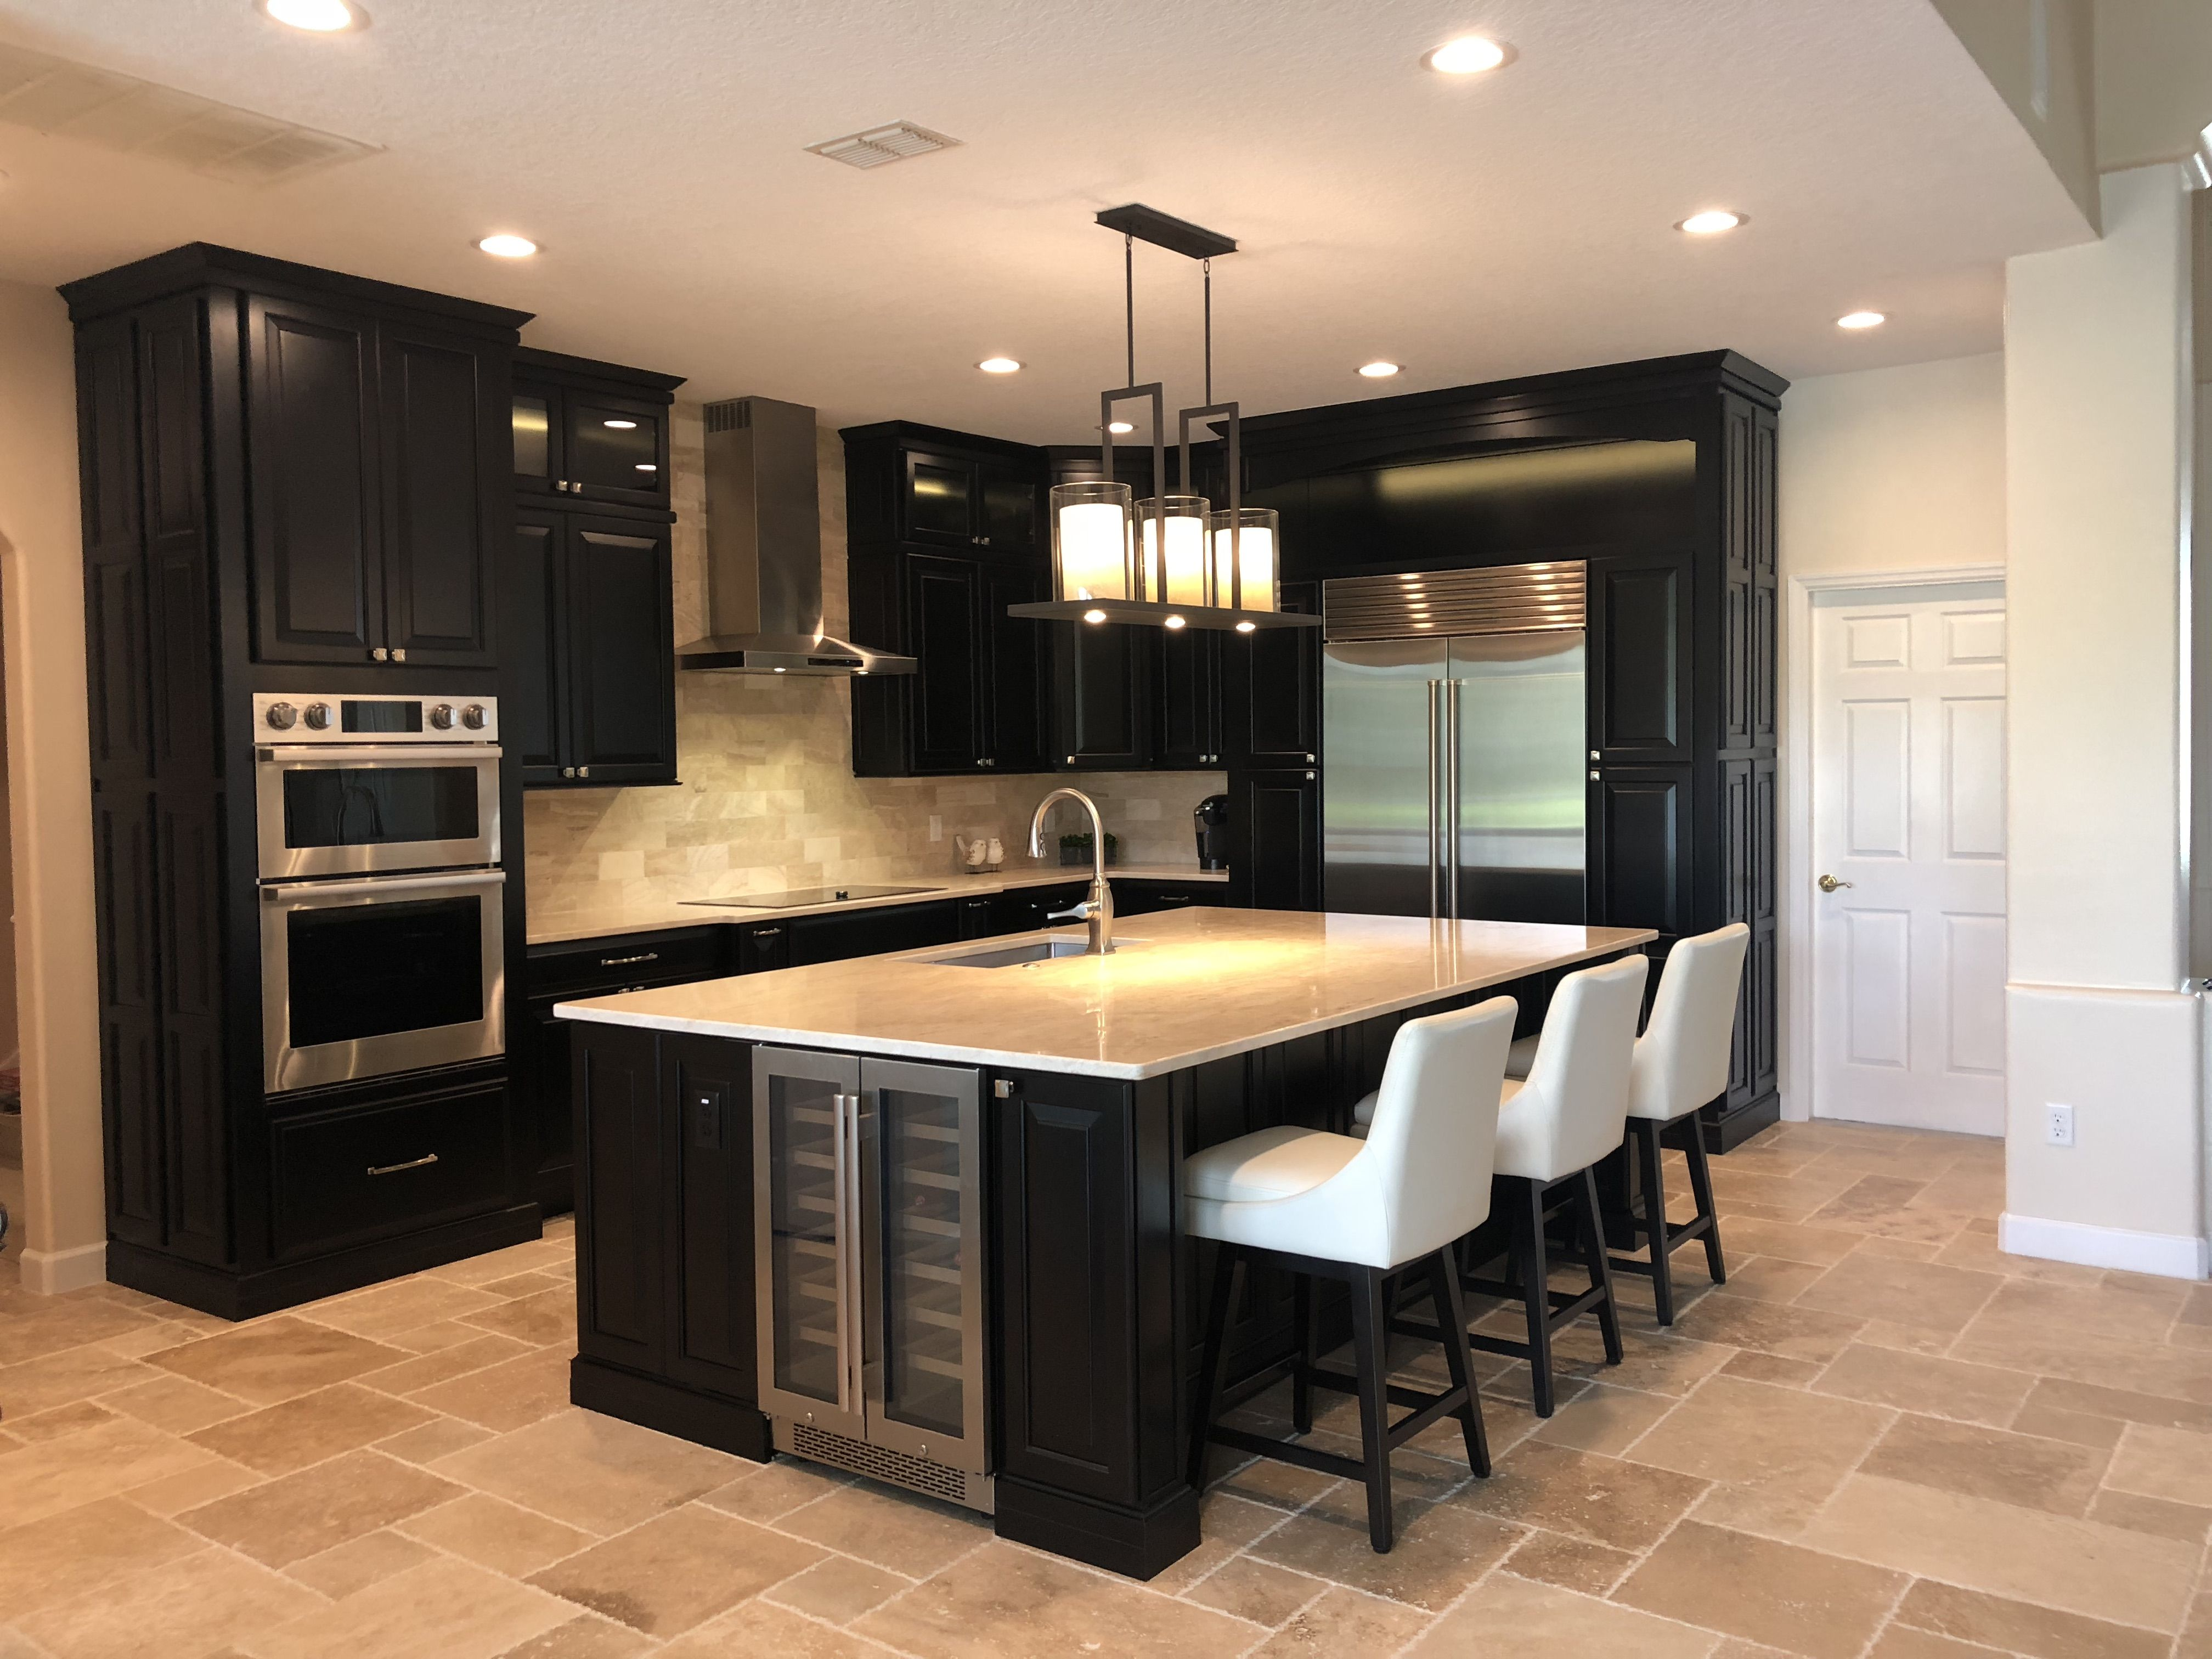 Orsota Project Kitchen Cabinets For Sale Kitchen Remodel Kitchen Decor Images